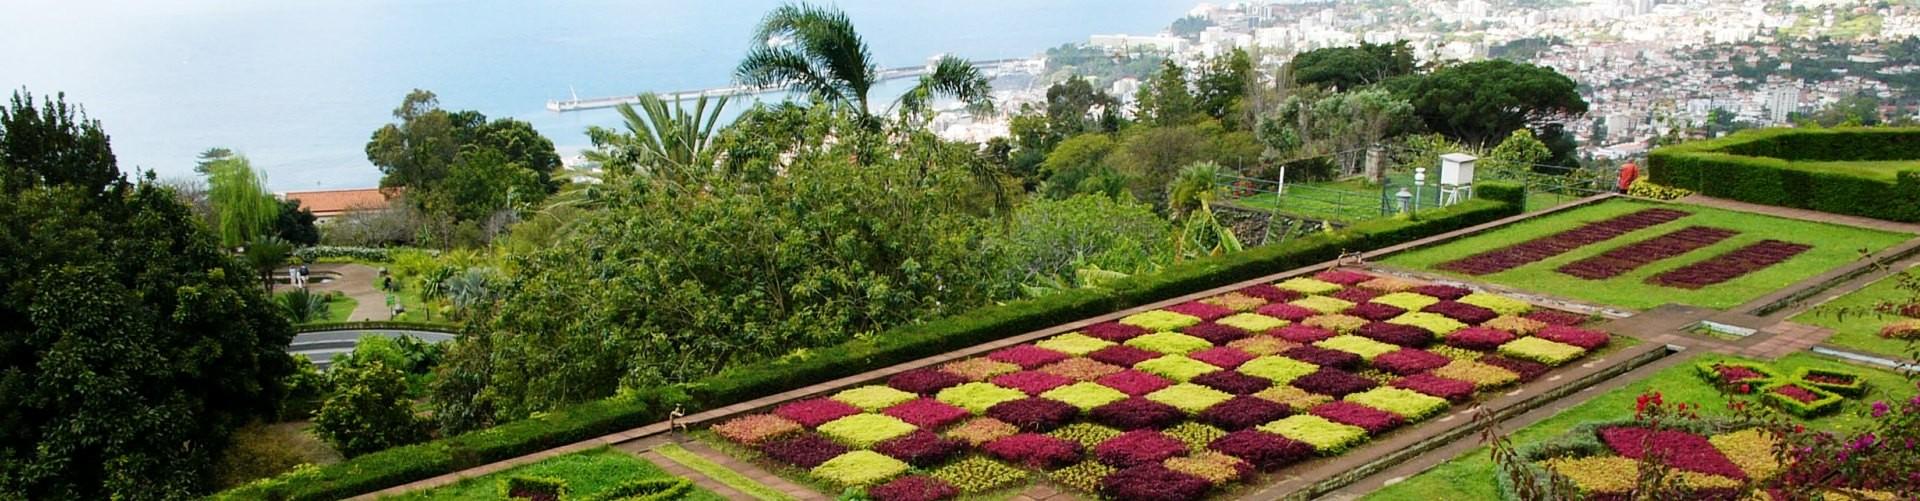 Botanical Garden in Madeira Island